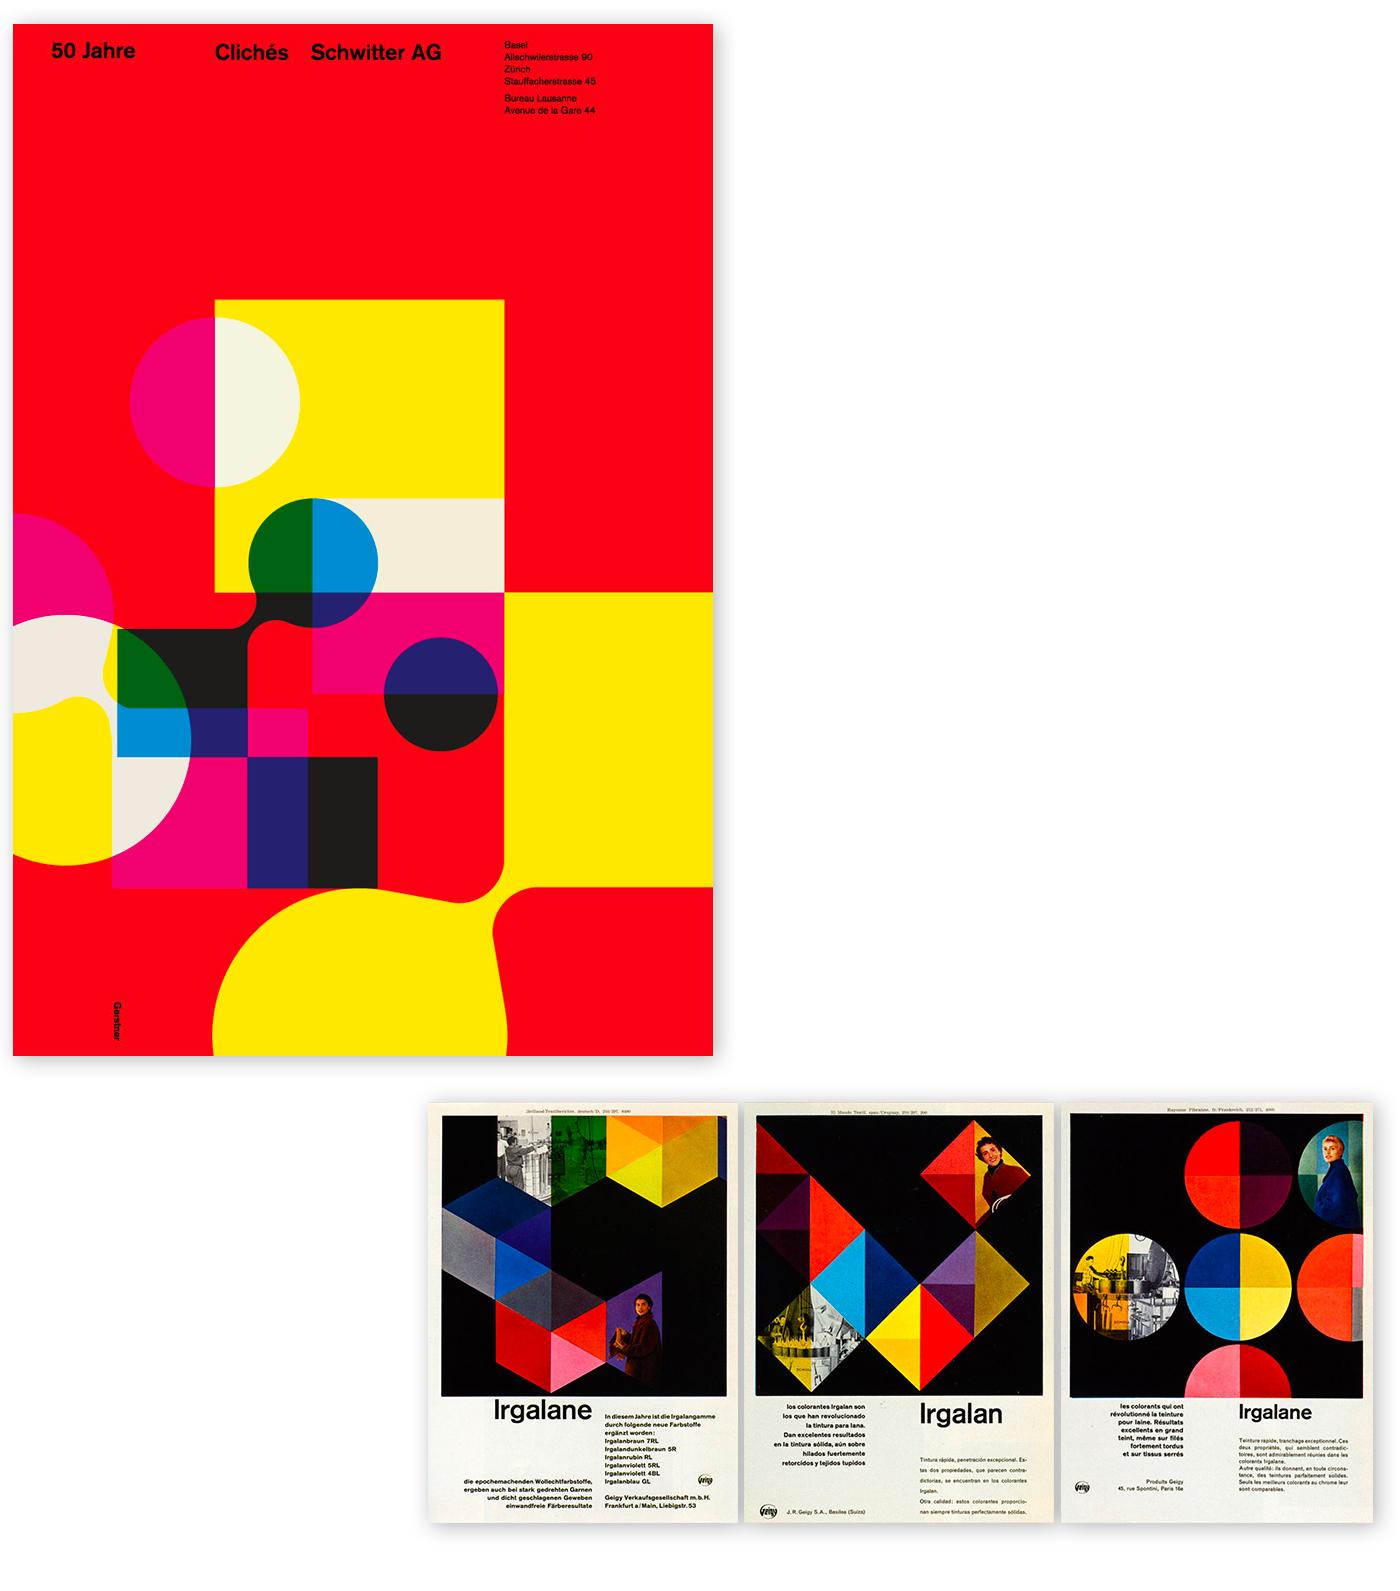 Karl Gerstner's posters